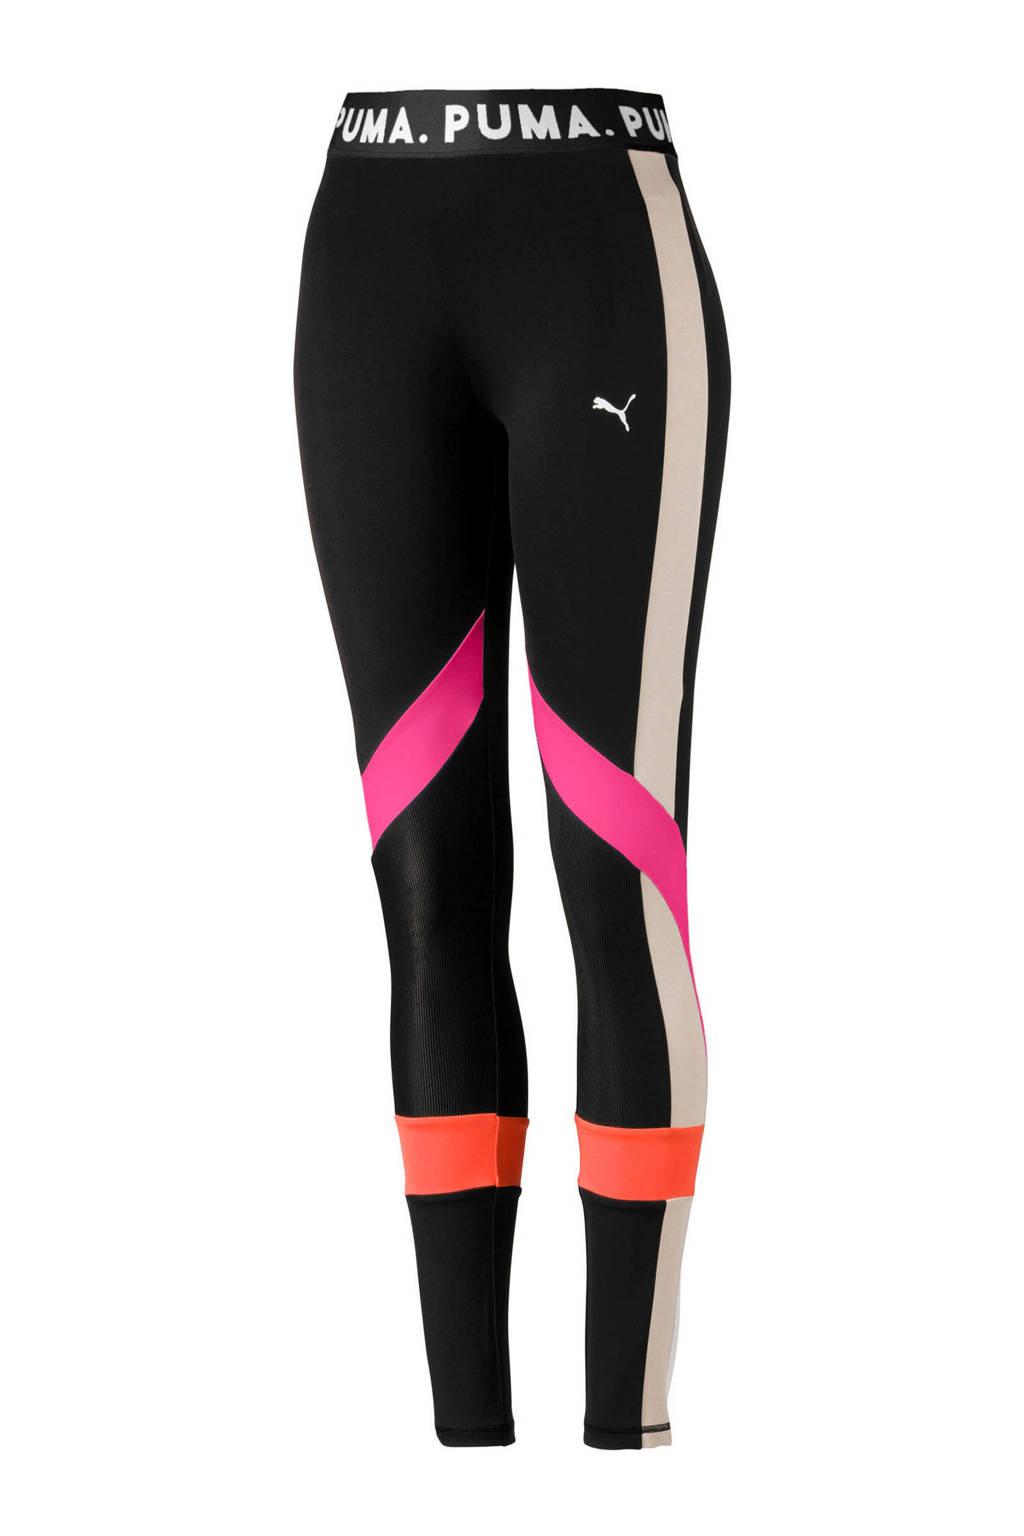 Puma legging zwart/roze/oranje, Zwart/roze/oranje